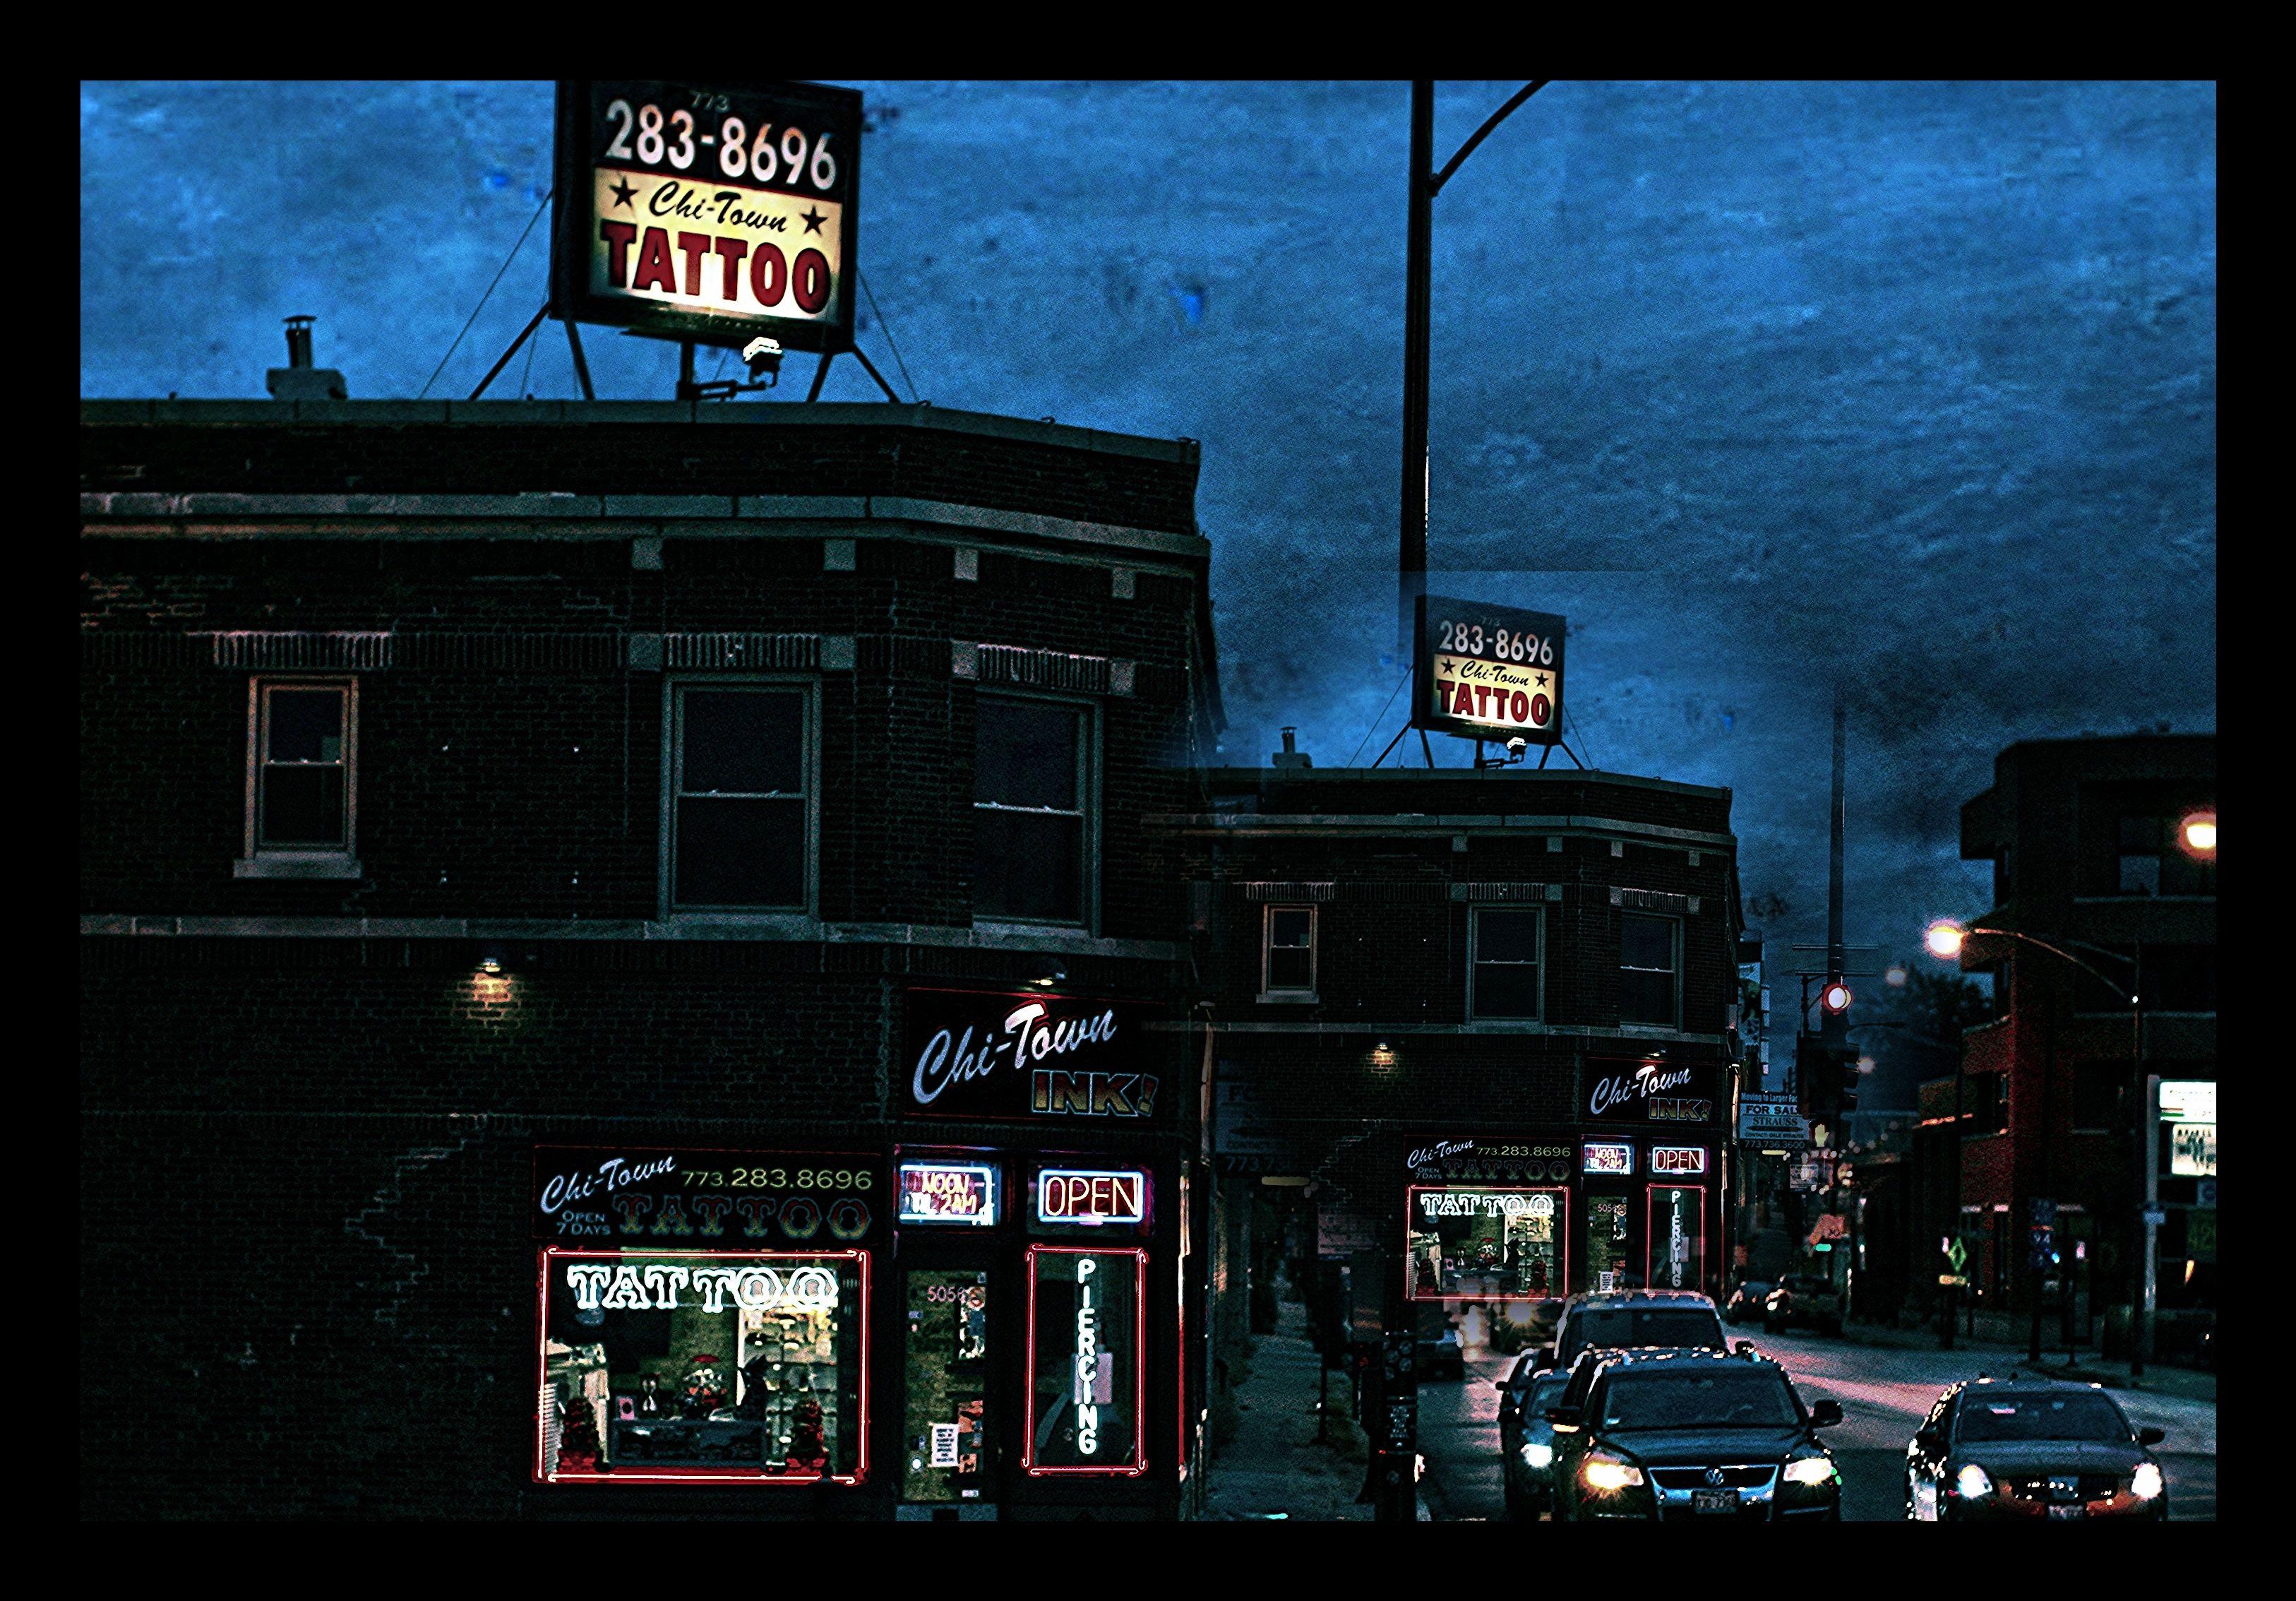 Chicago tattoo body piercing shop chitown custom